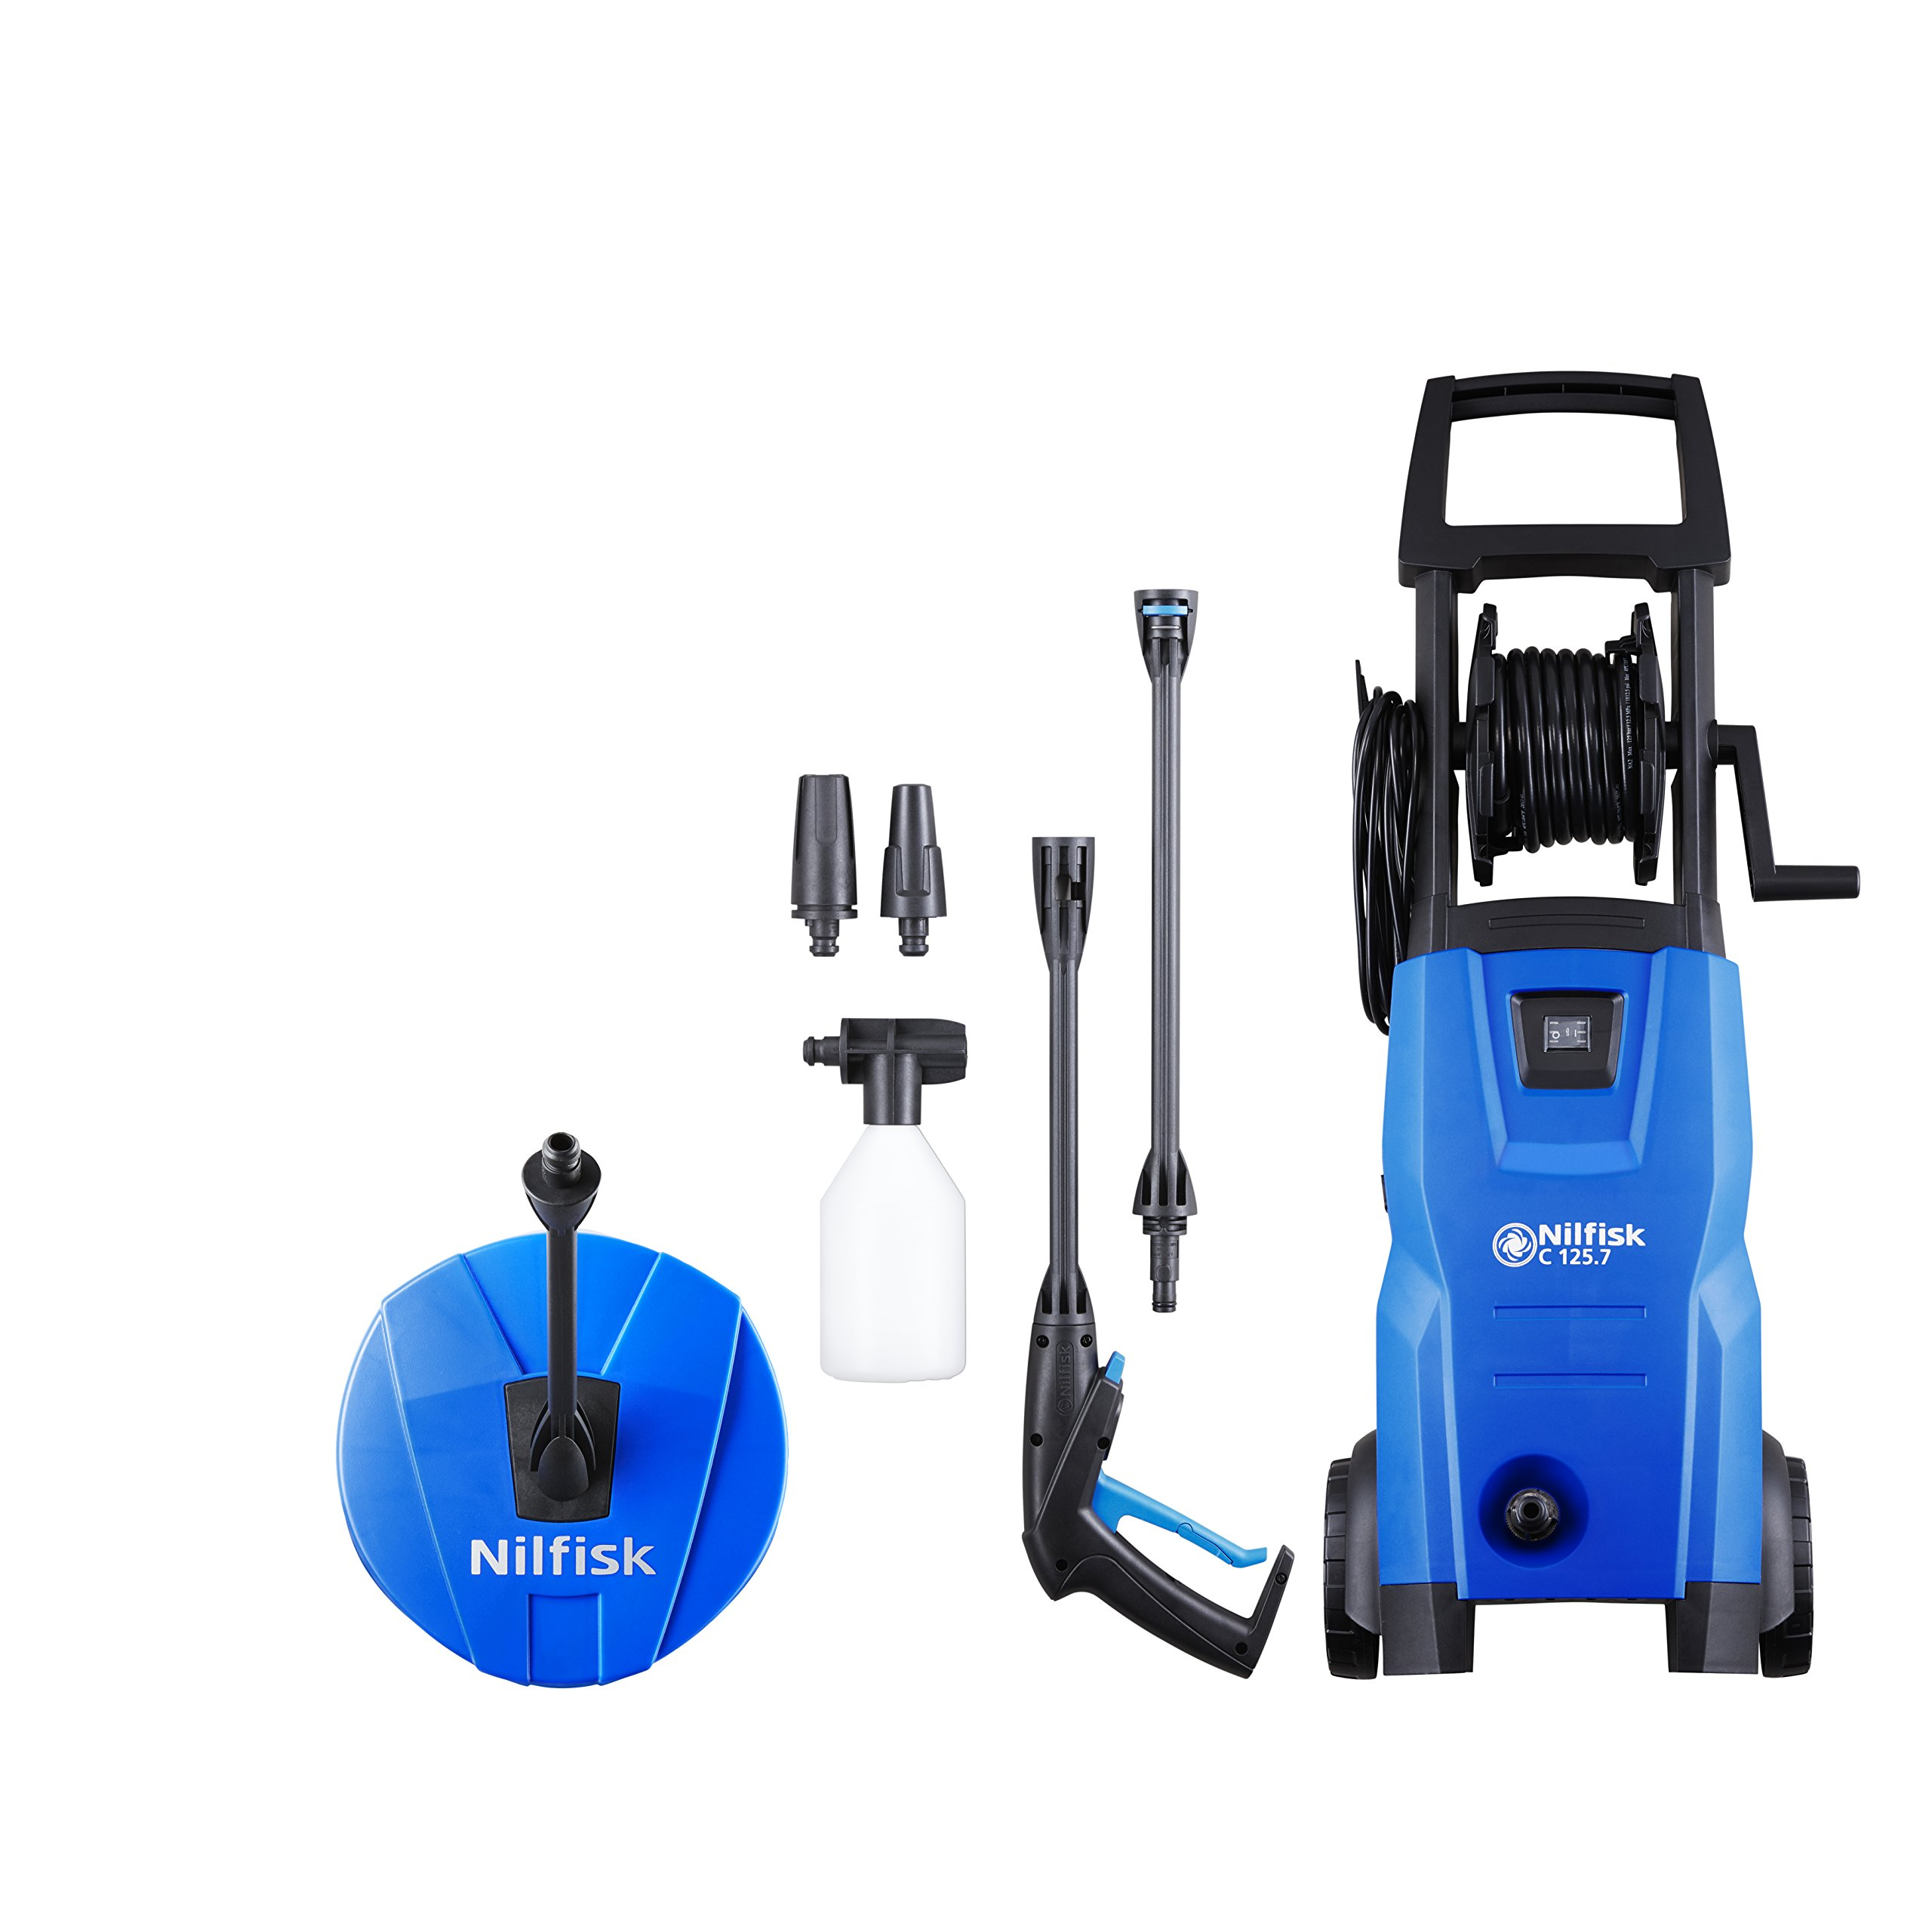 Nilfisk-128470805-C-1257-6-PC-X-tra-Hochdruckreiniger-1500-W-230-V-Blau